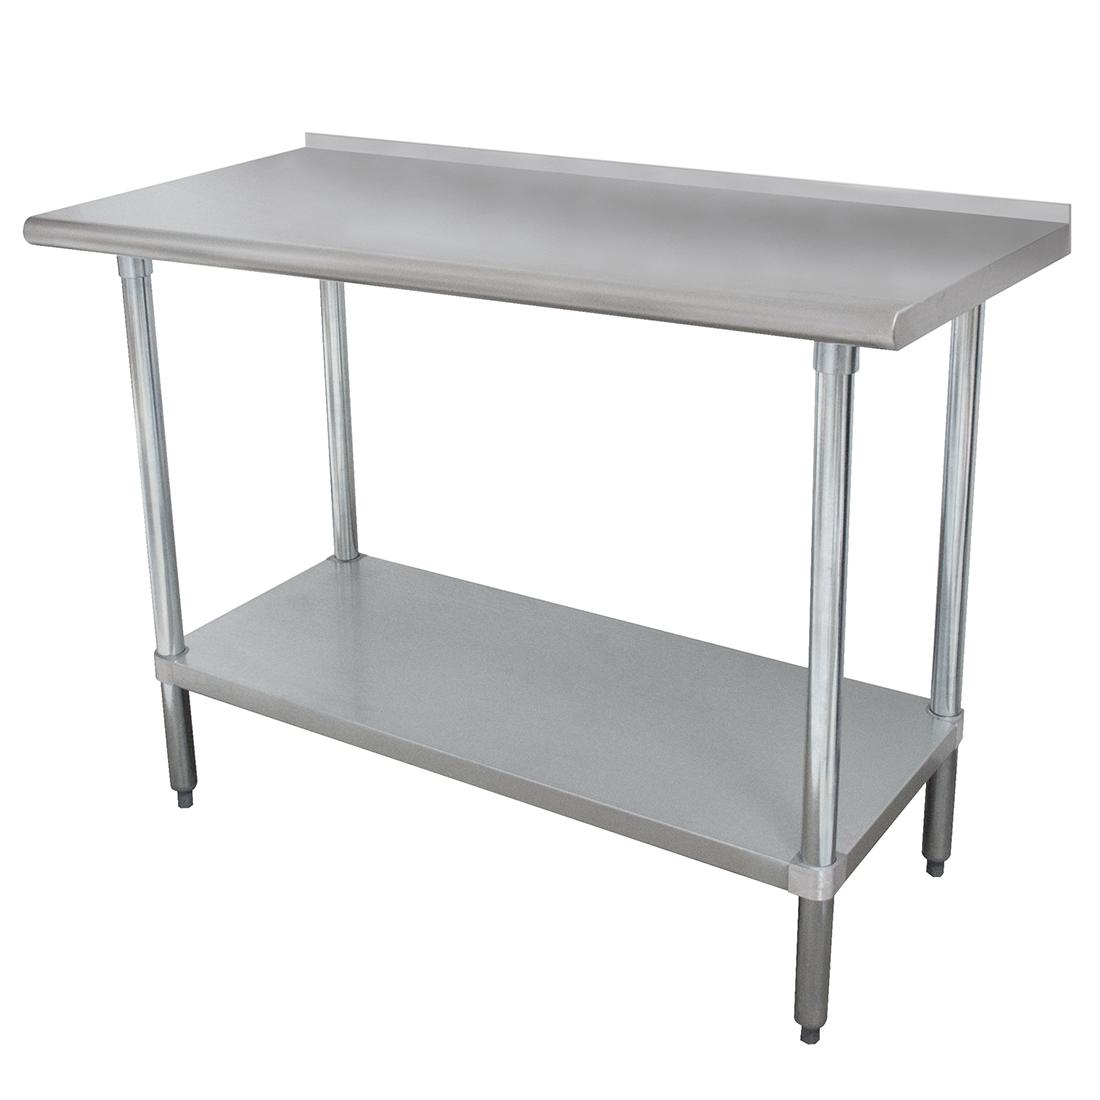 Advance Tabco SFG-366 work table,  63